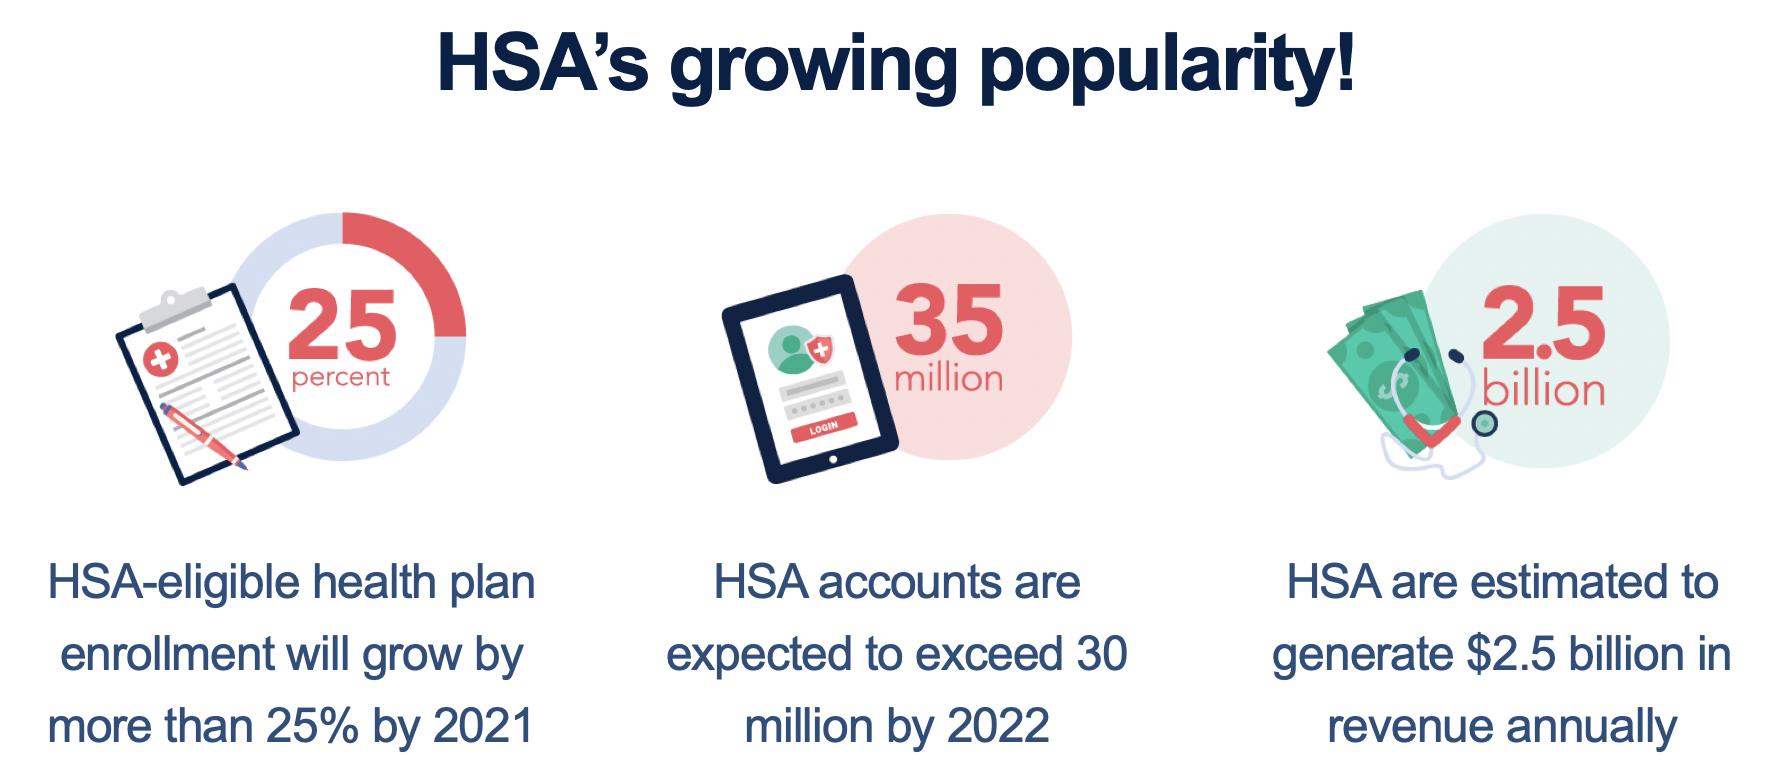 HSAs Popularity